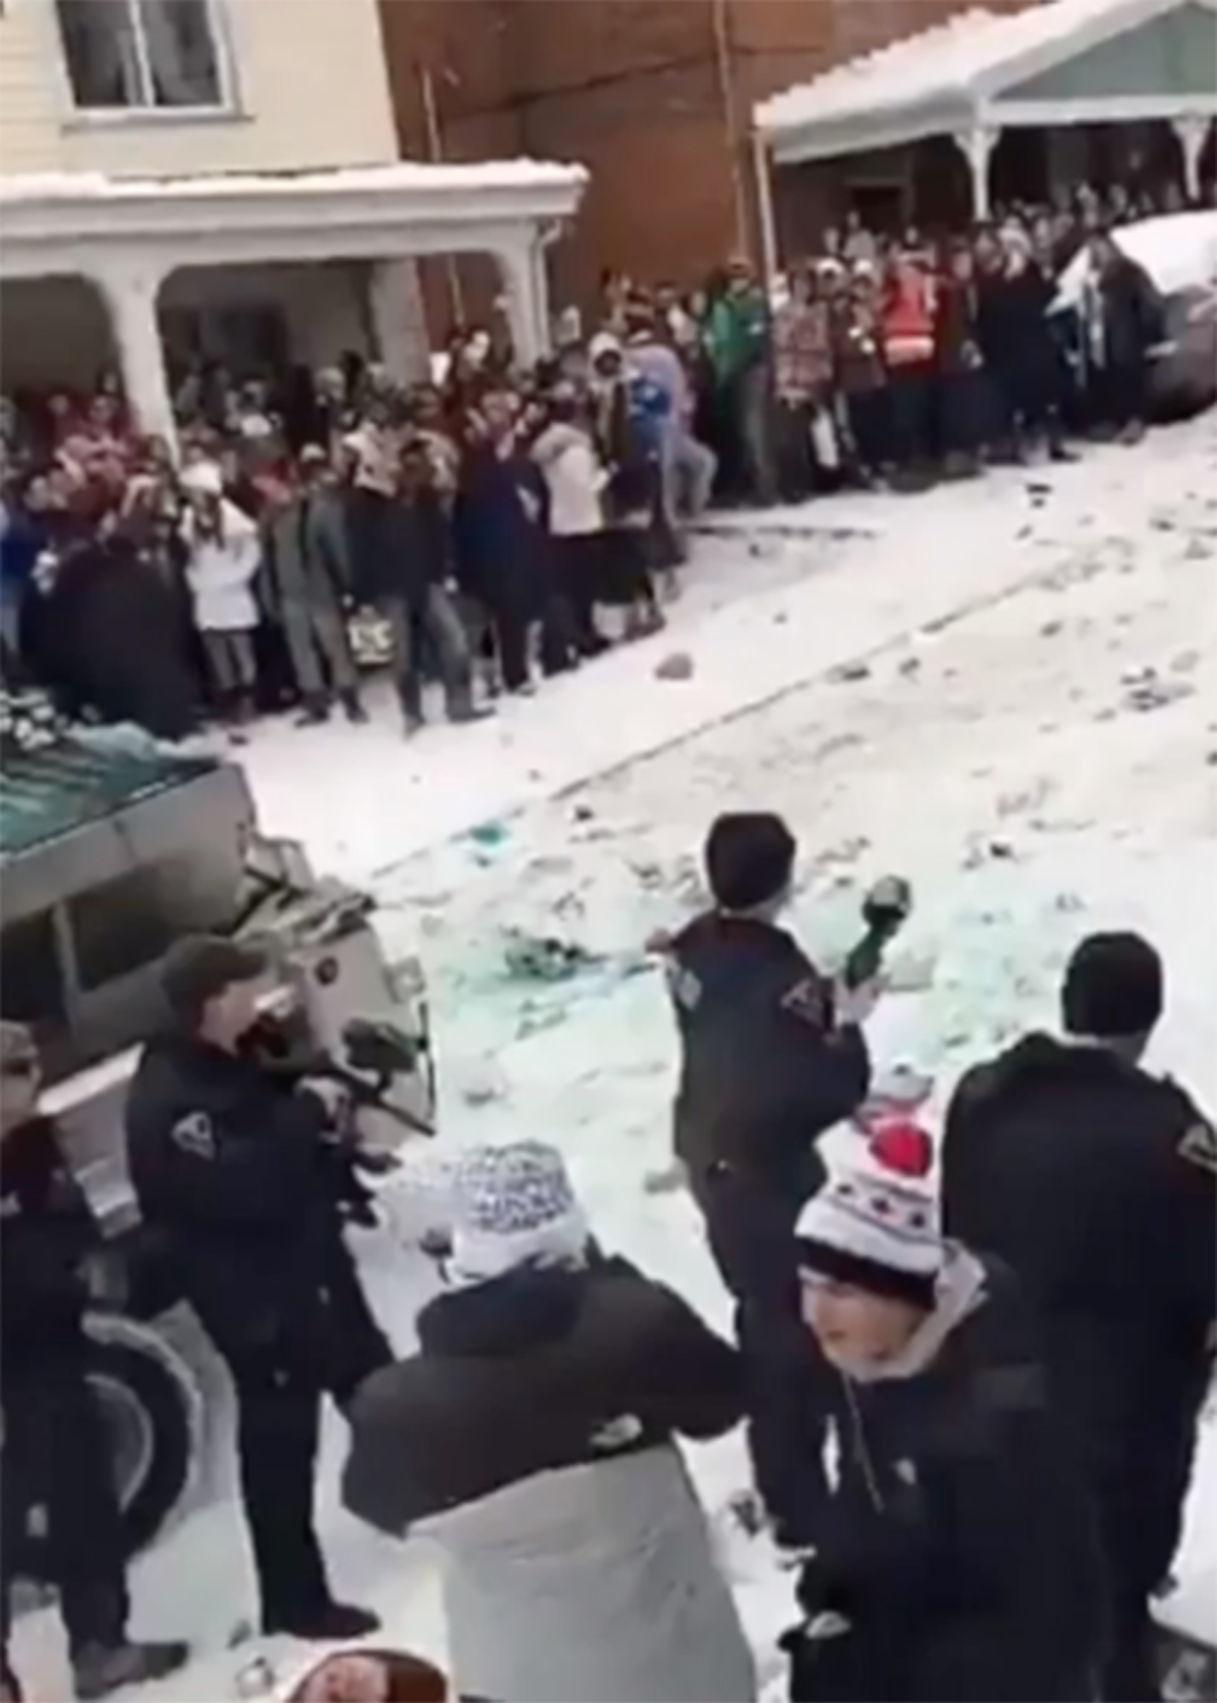 WVU students/police confrontation